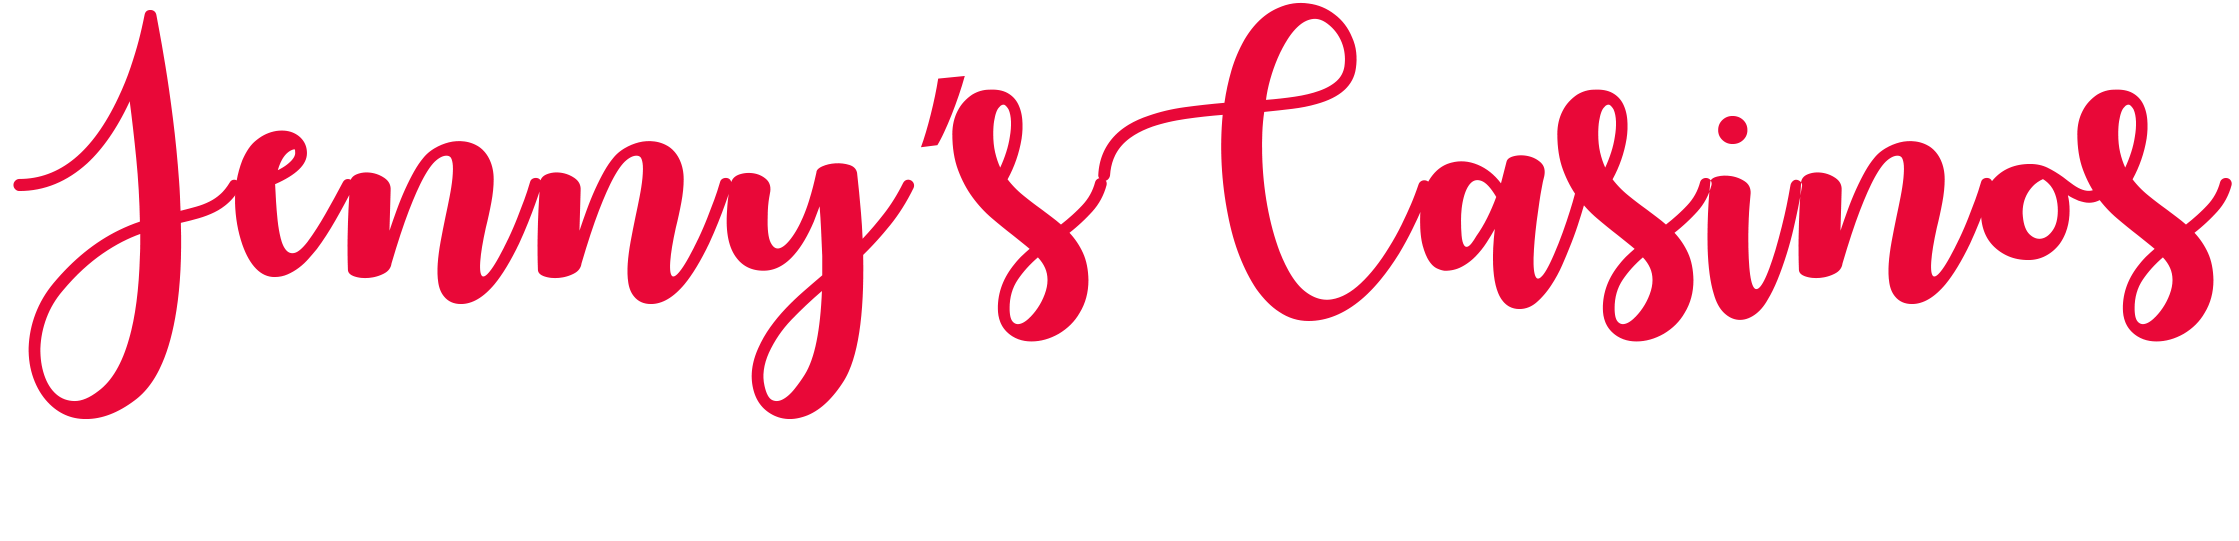 jennyscasinos-logo111.png